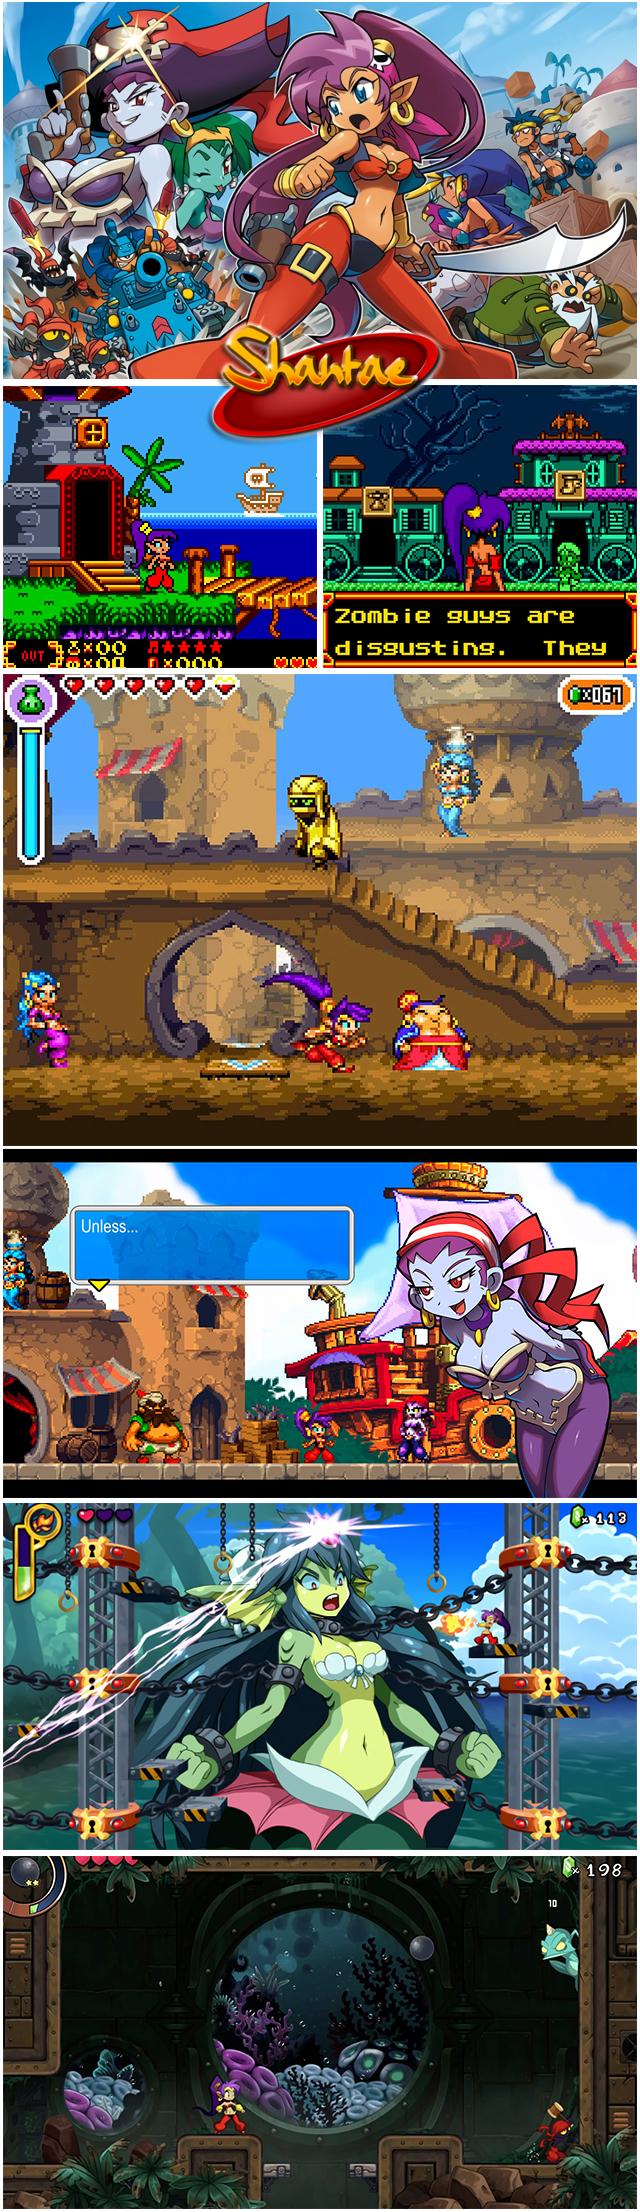 Shantae réédition Limited Machin Shantaecompil